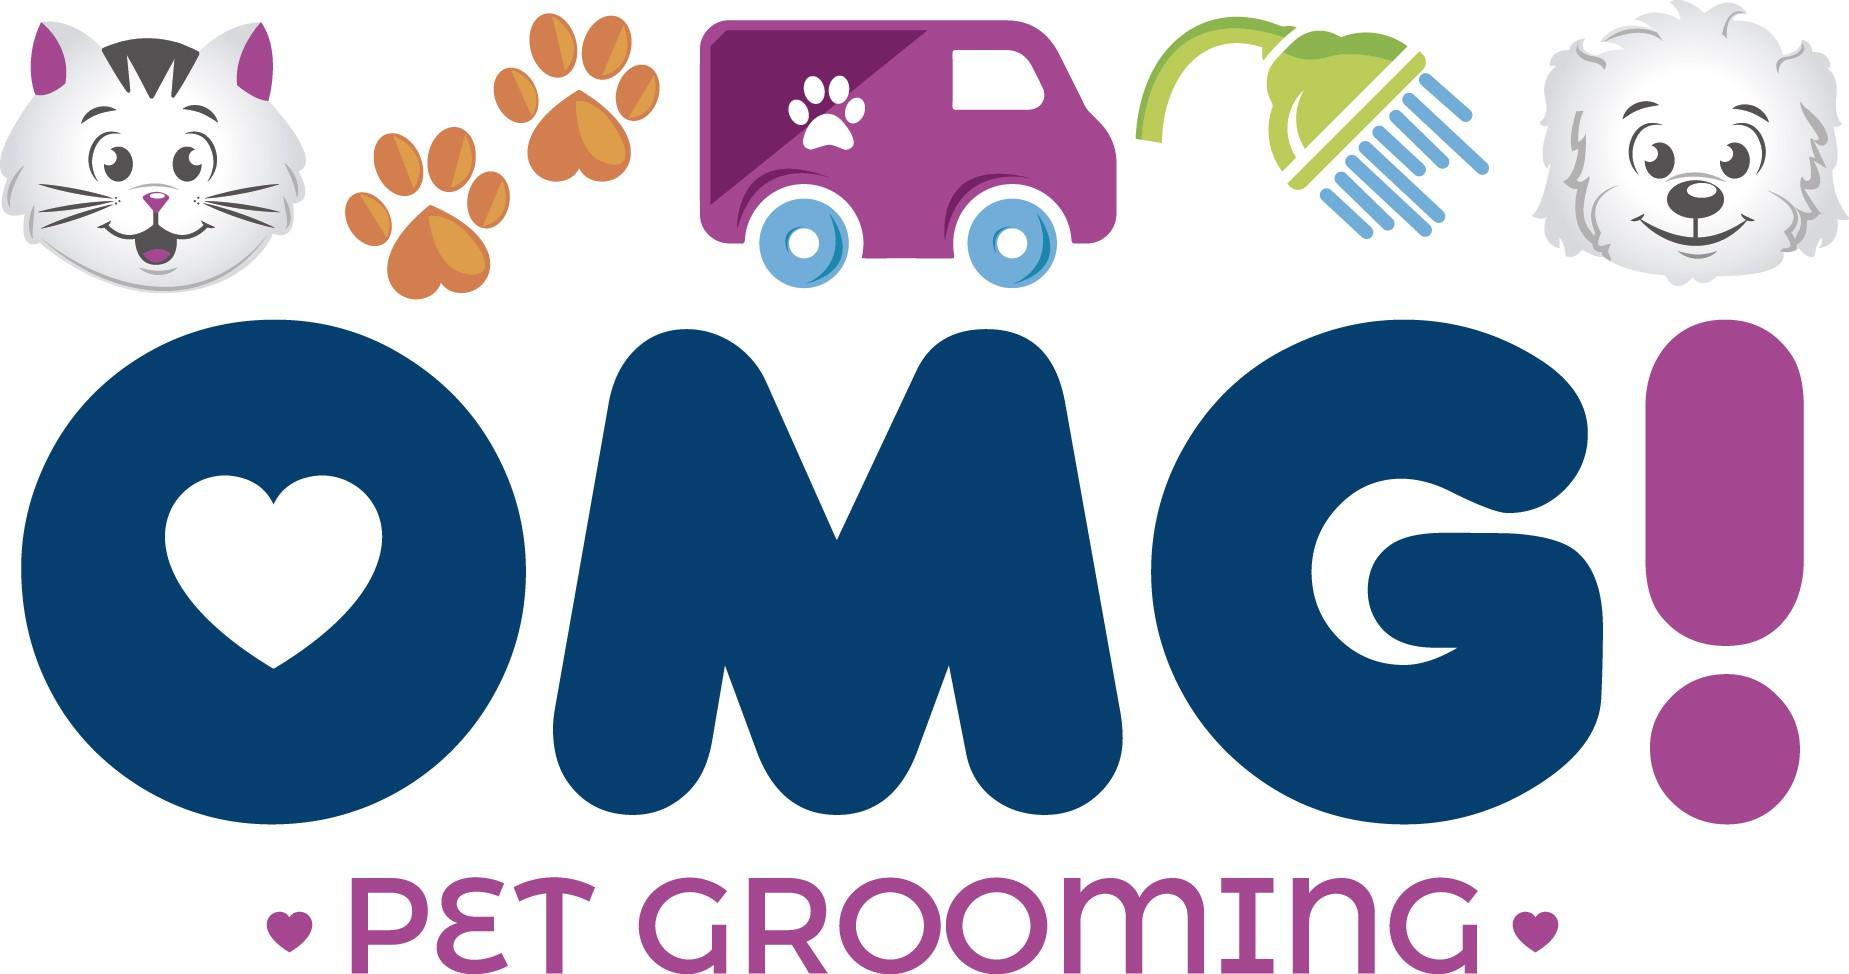 Mobile Dog Grooming Van Needs an Emoji Style Logo